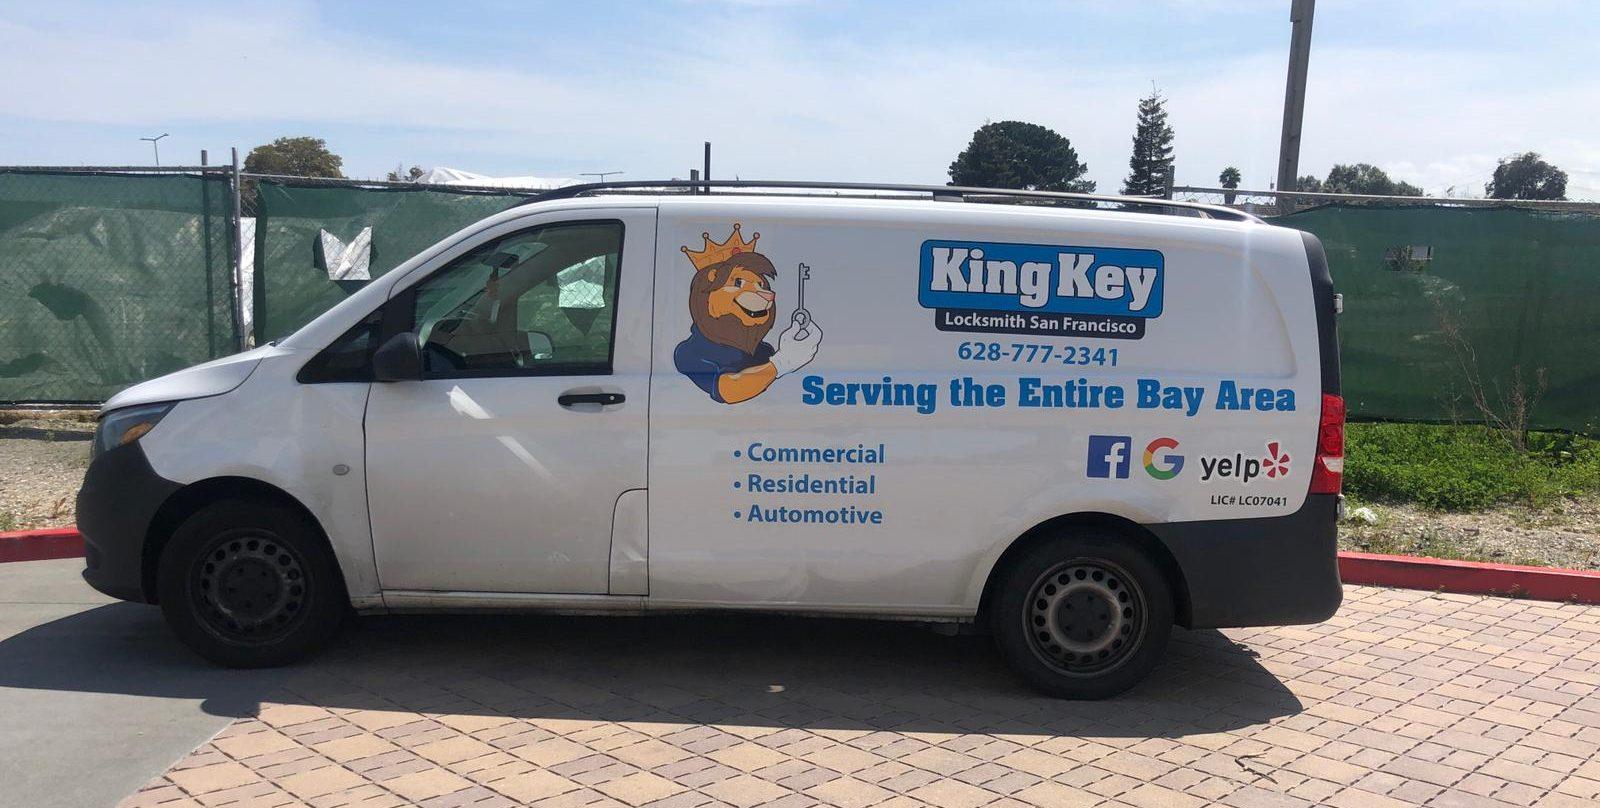 car Key service in austin, tx